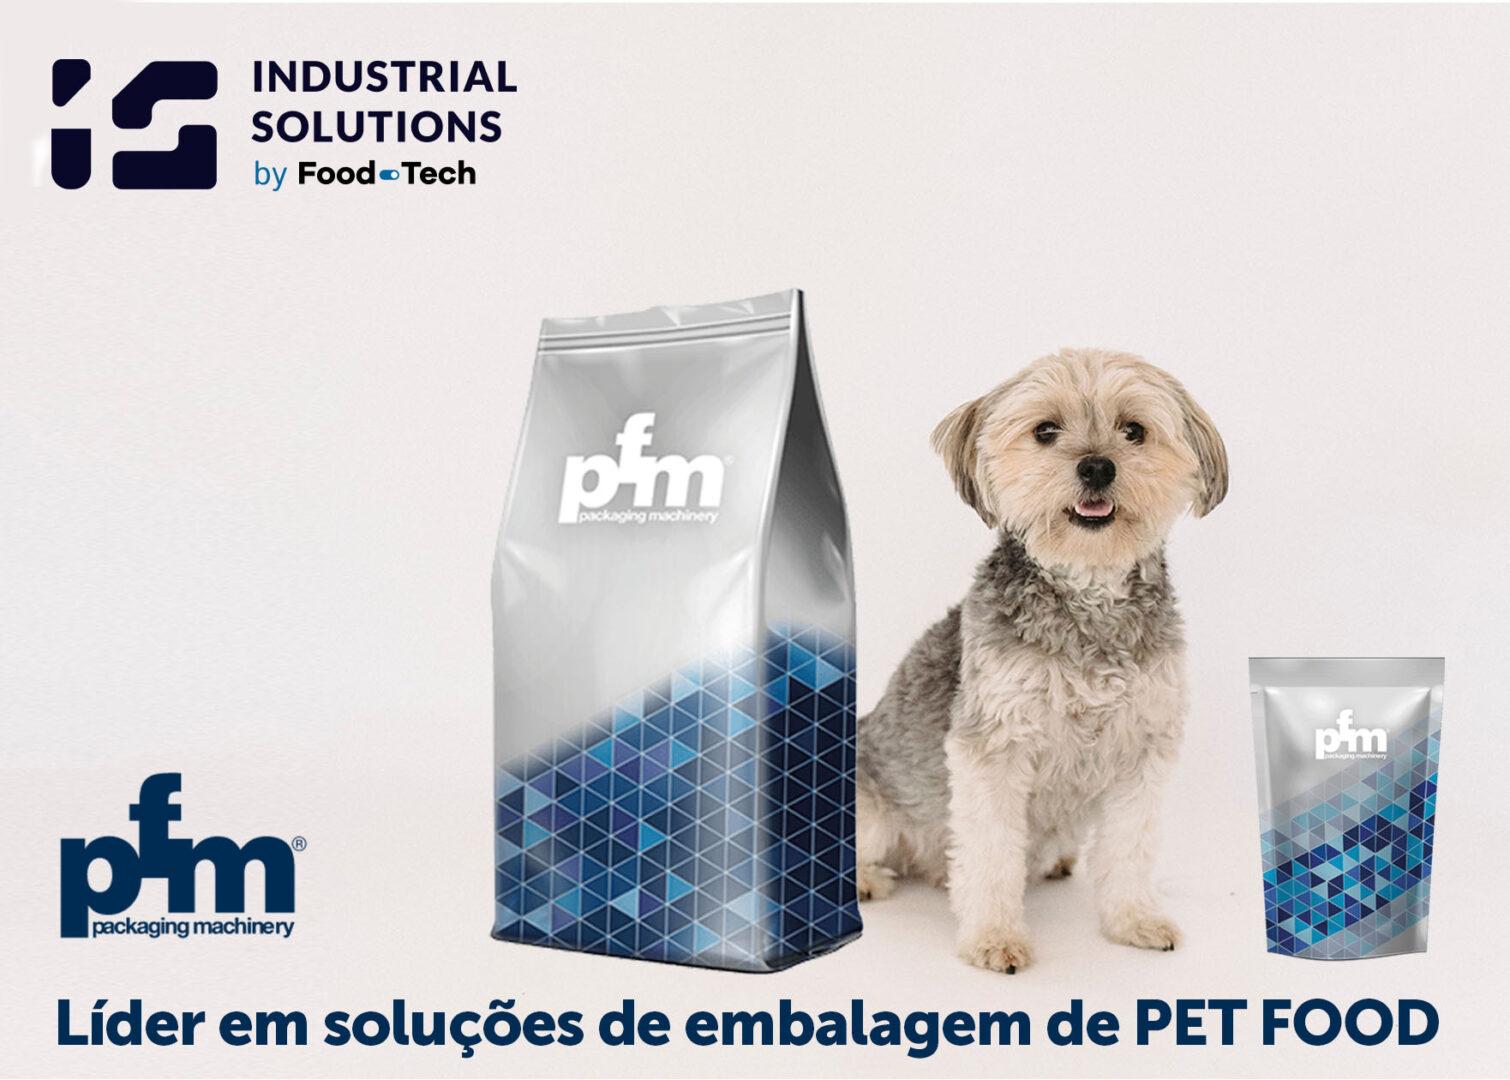 embalagenss-para-racao-aracao-animal-pfm-post